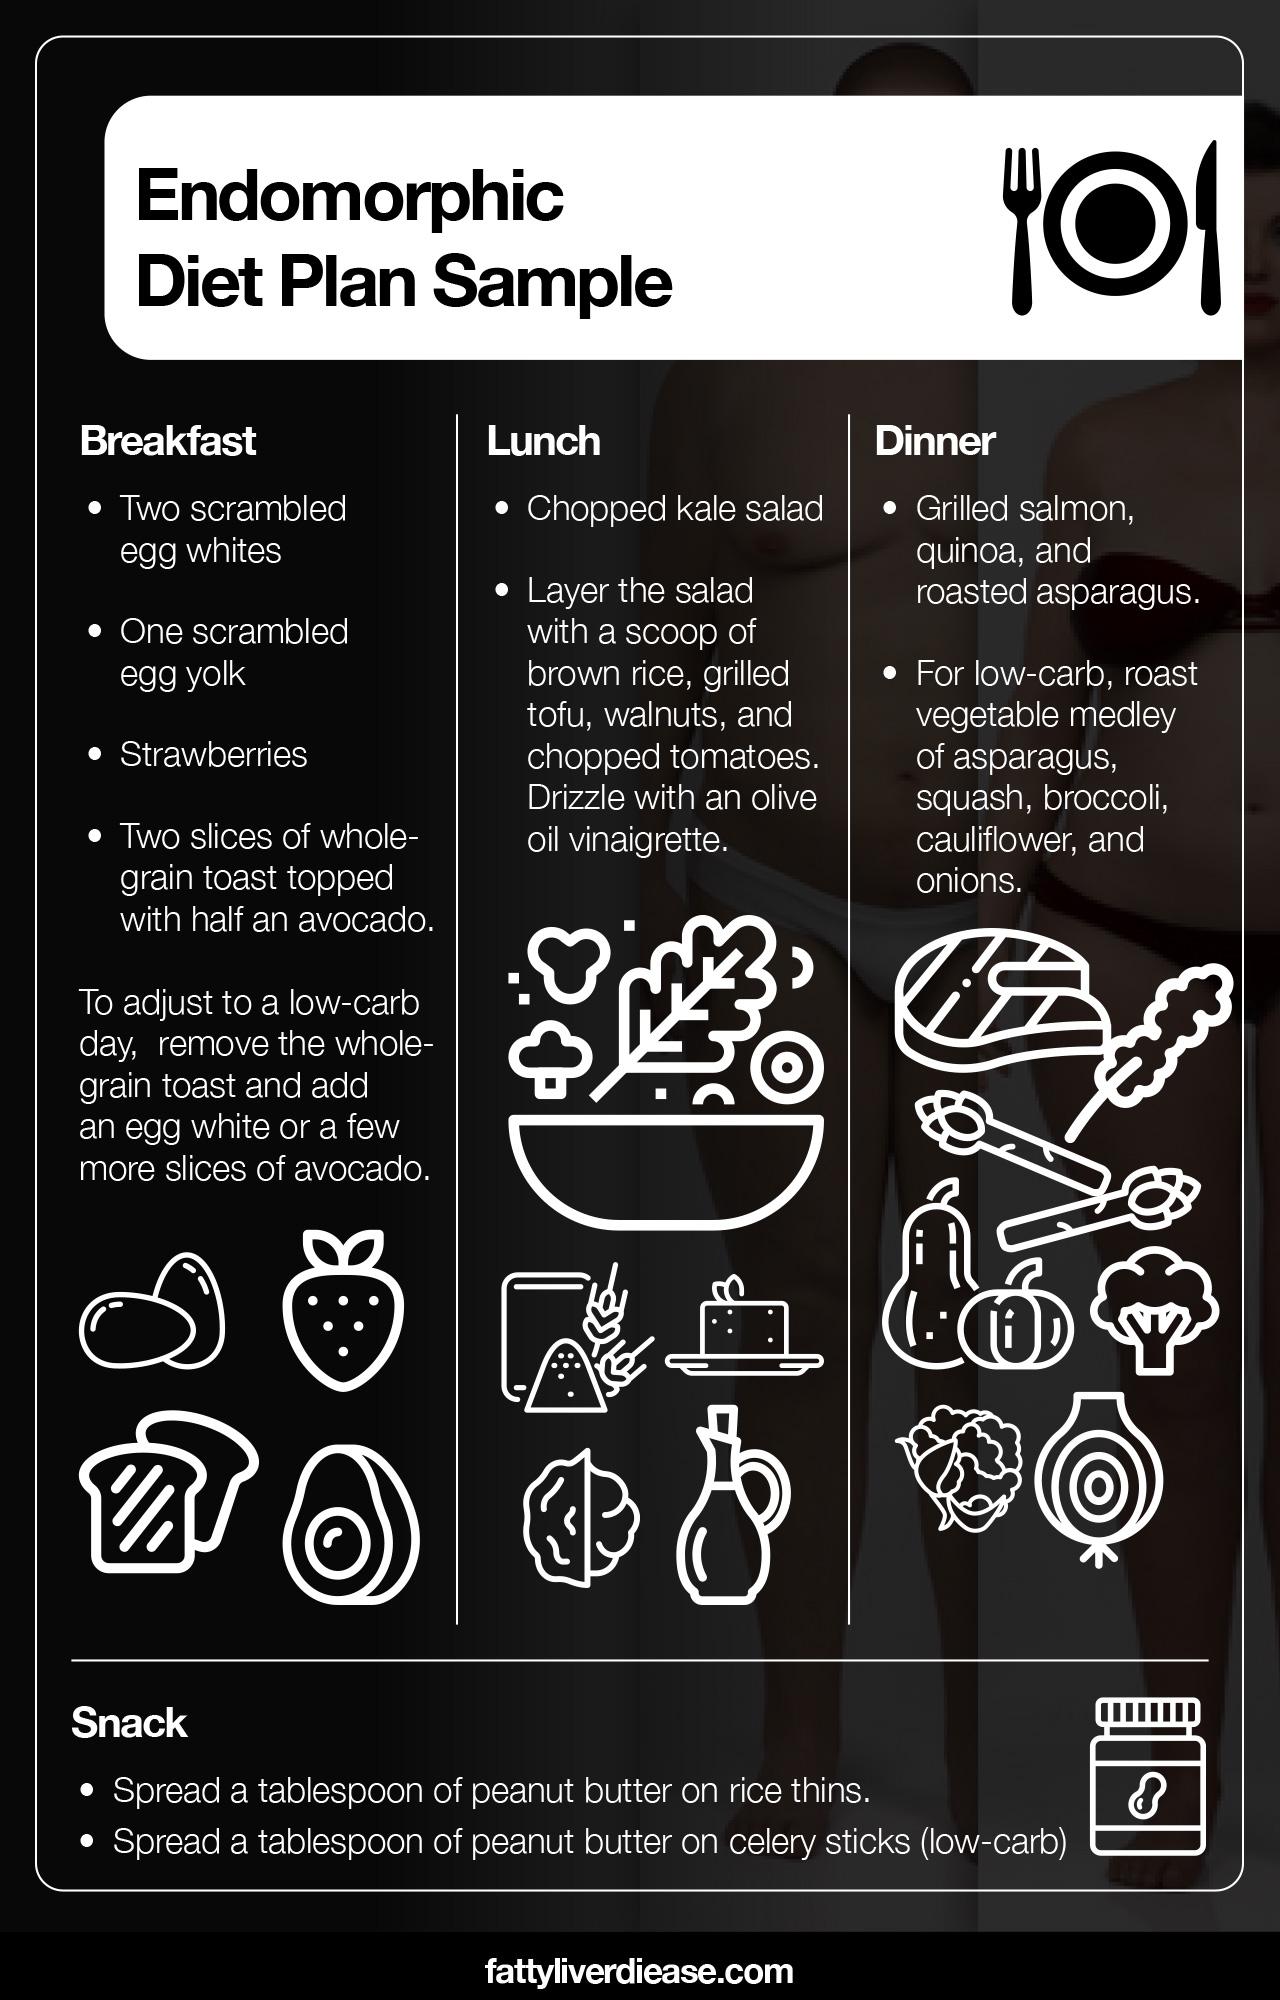 Endomorphic Diet Plan Sample